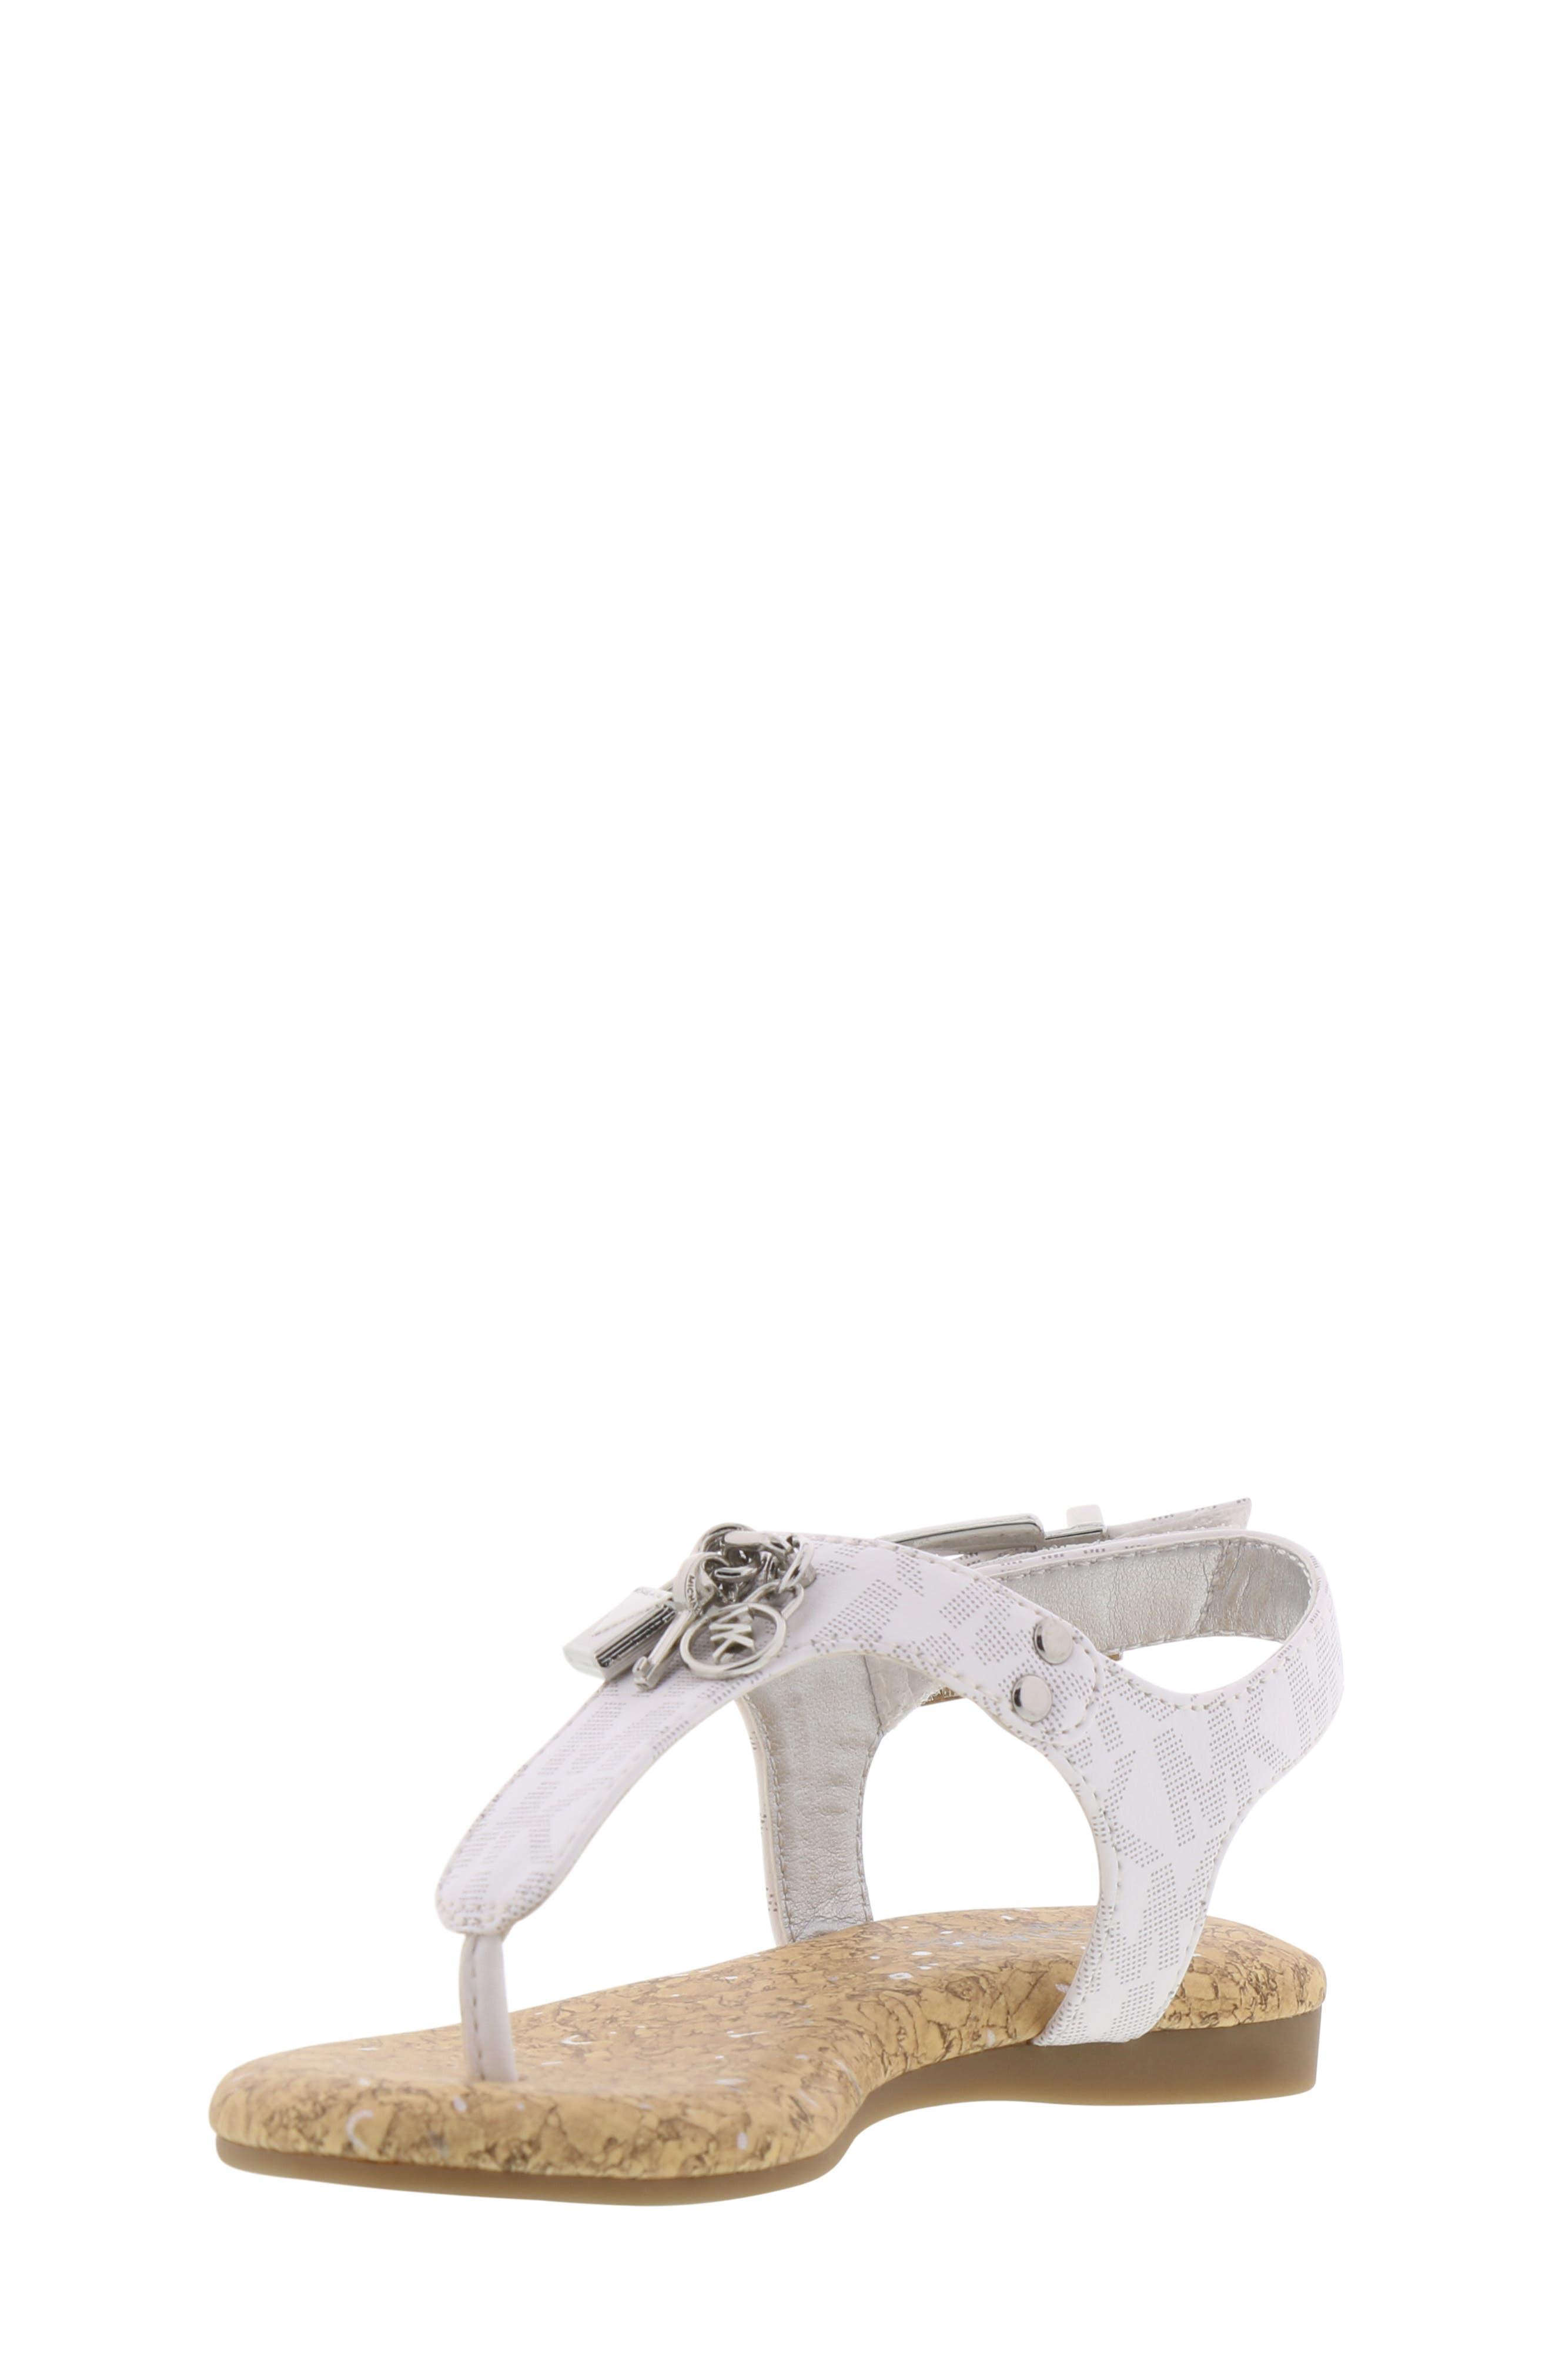 MICHAEL MICHAEL KORS, Tilly Cora Charm T-Strap Sandal, Alternate thumbnail 9, color, WHITE LOGO